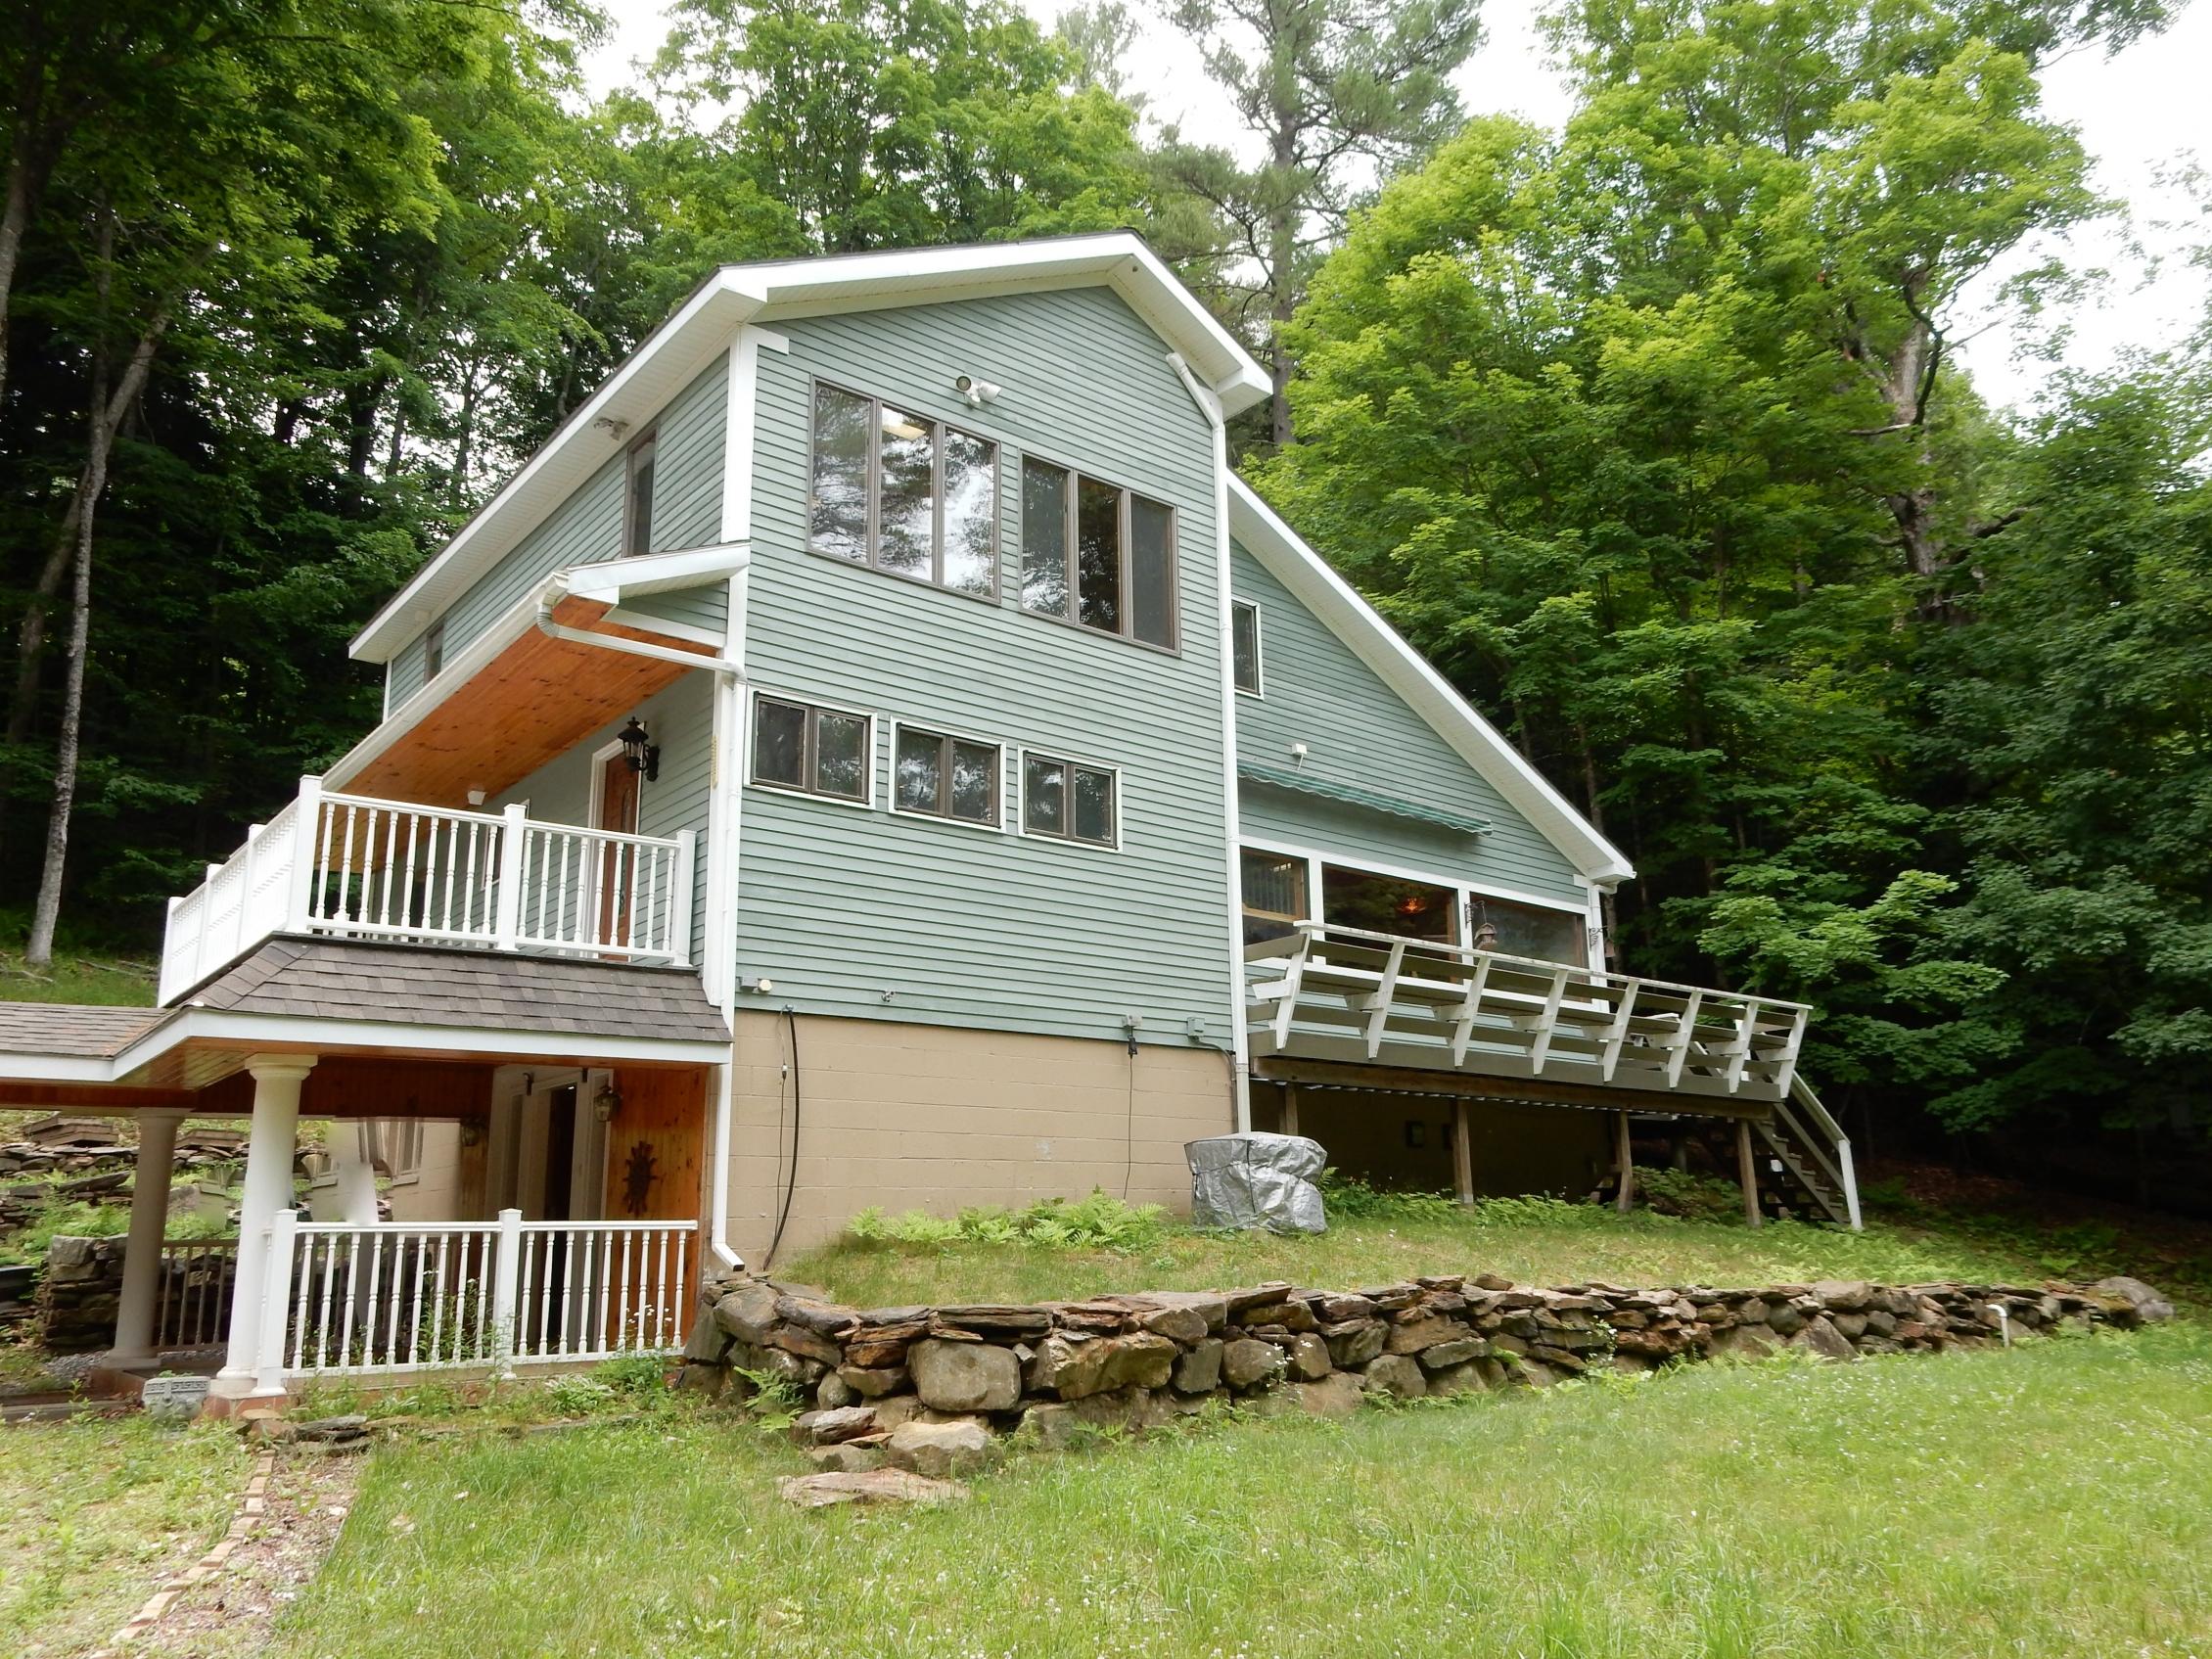 Single Family Home for Sale at 1 Ledge, Hanover 1 Ledge Rd Hanover, New Hampshire, 03755 United States